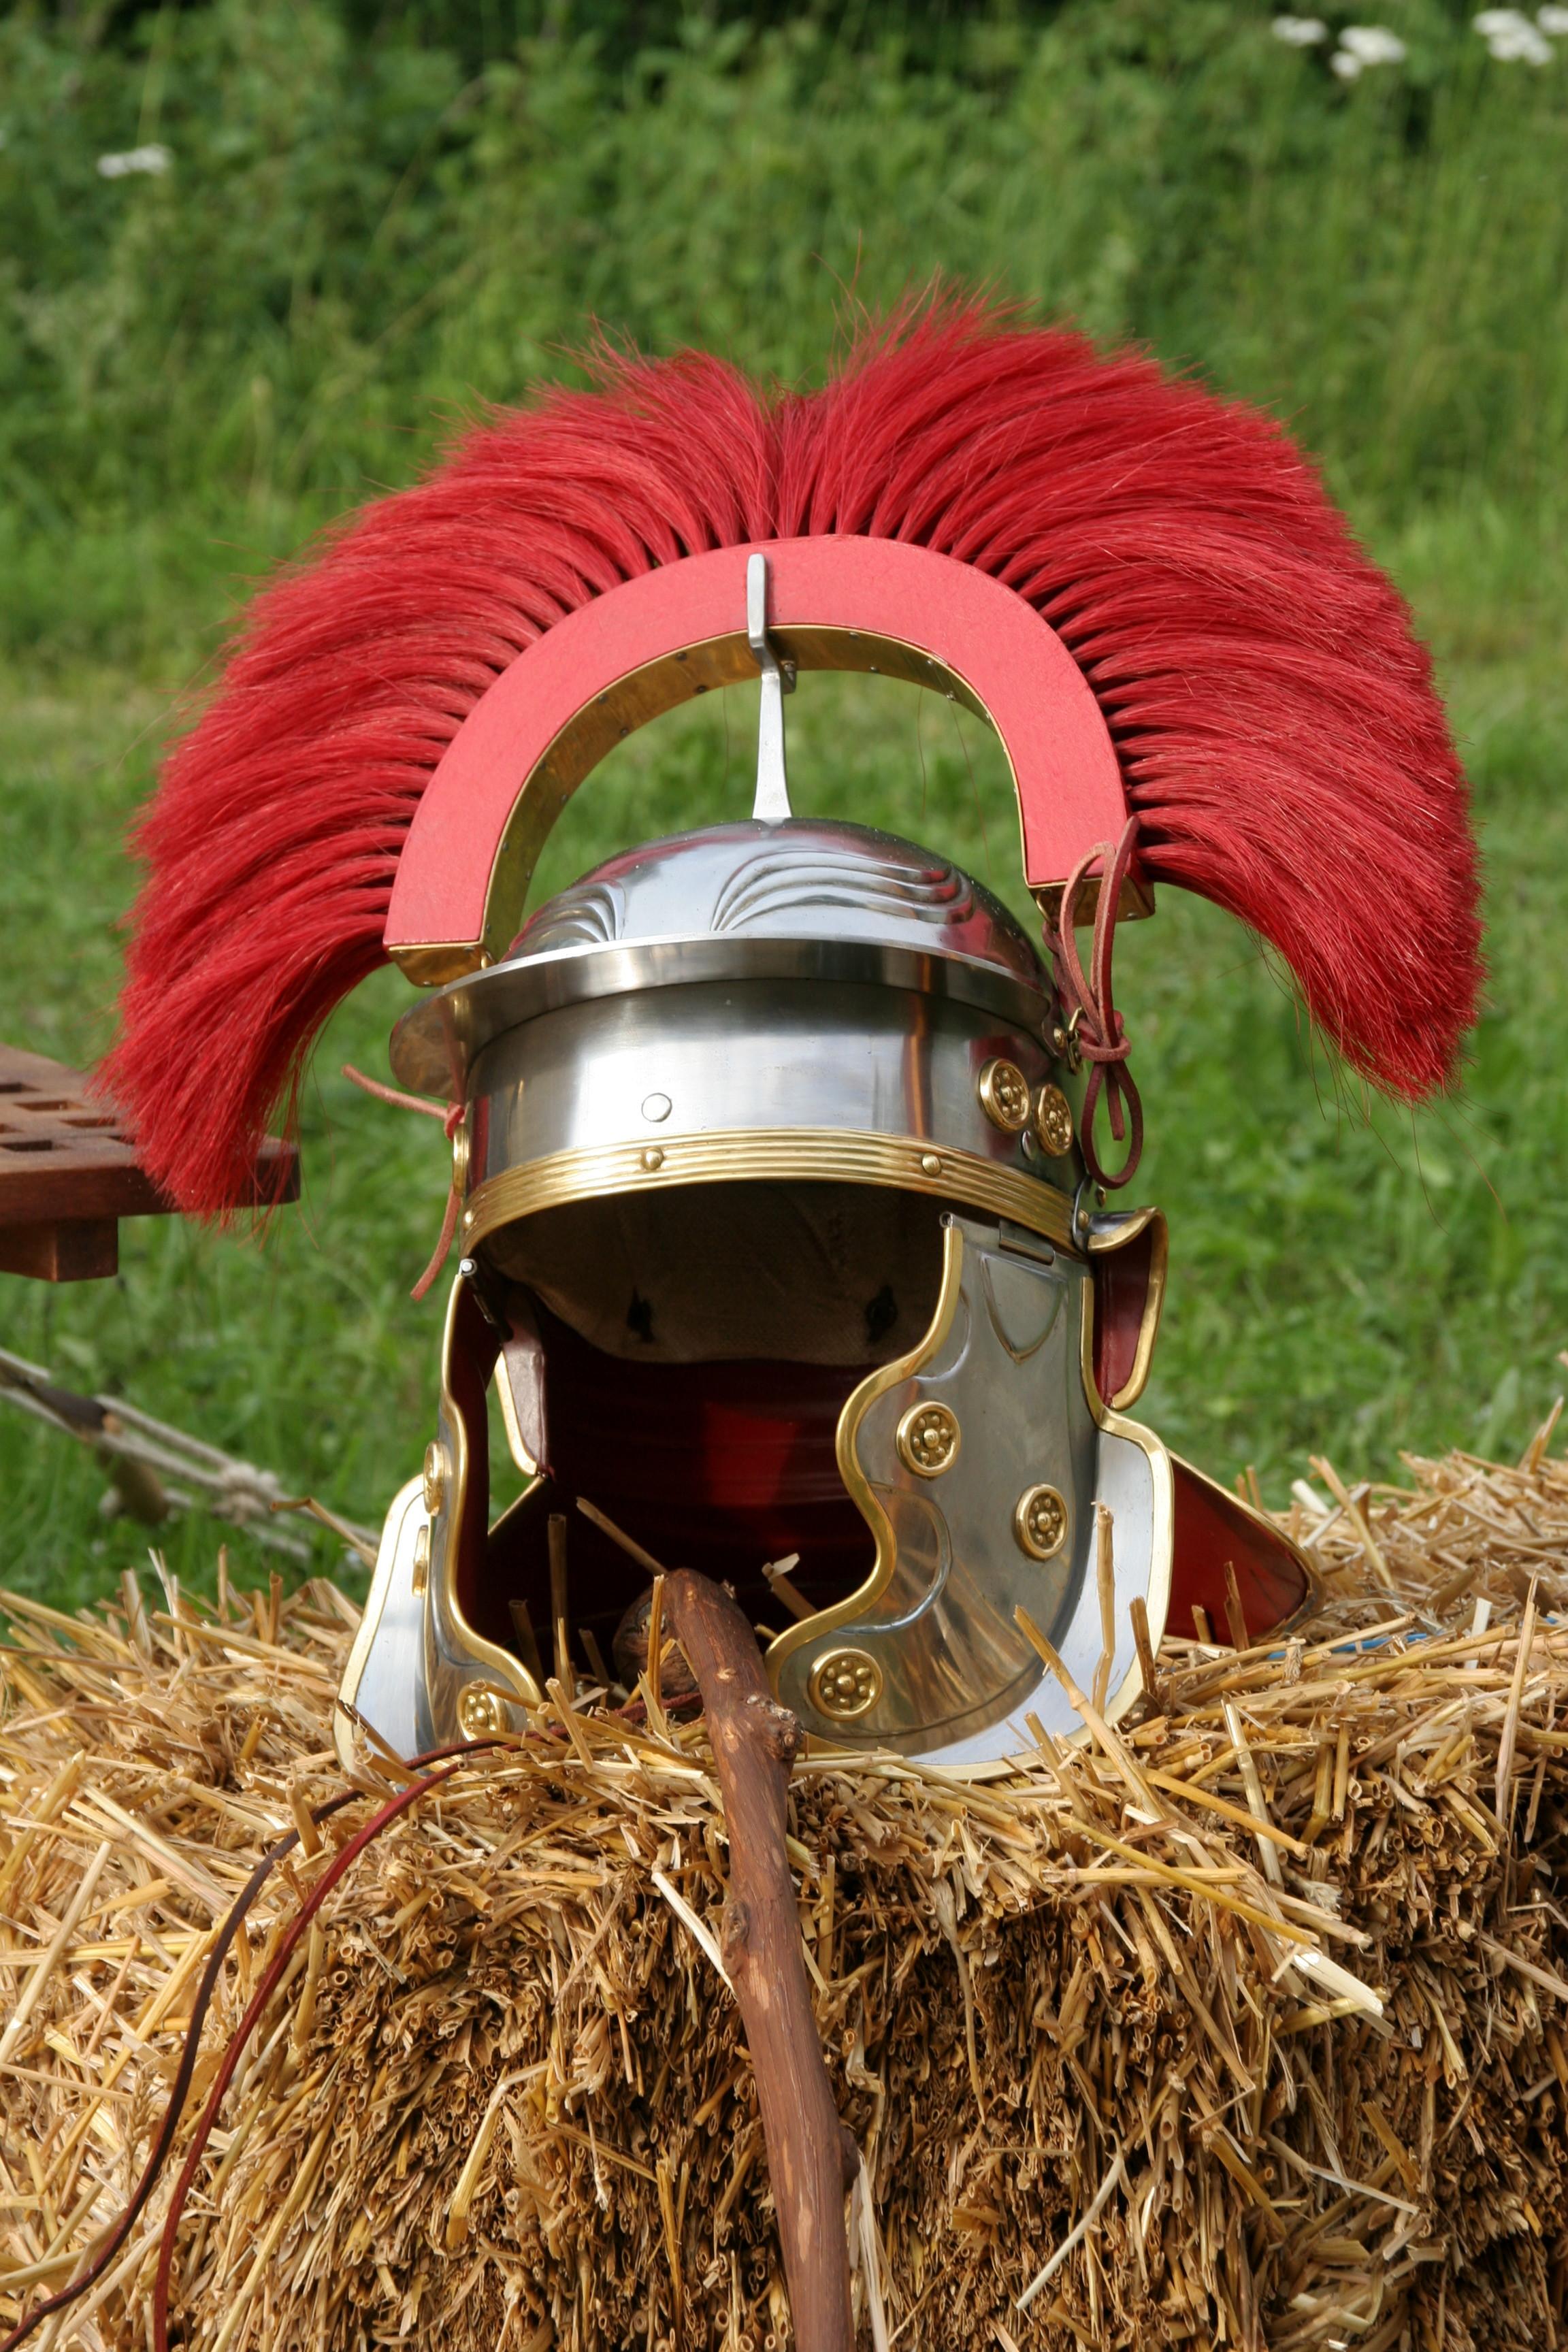 Details about  /Medieval Roman Centurion Helmet Armor Removable Red Crest Plume